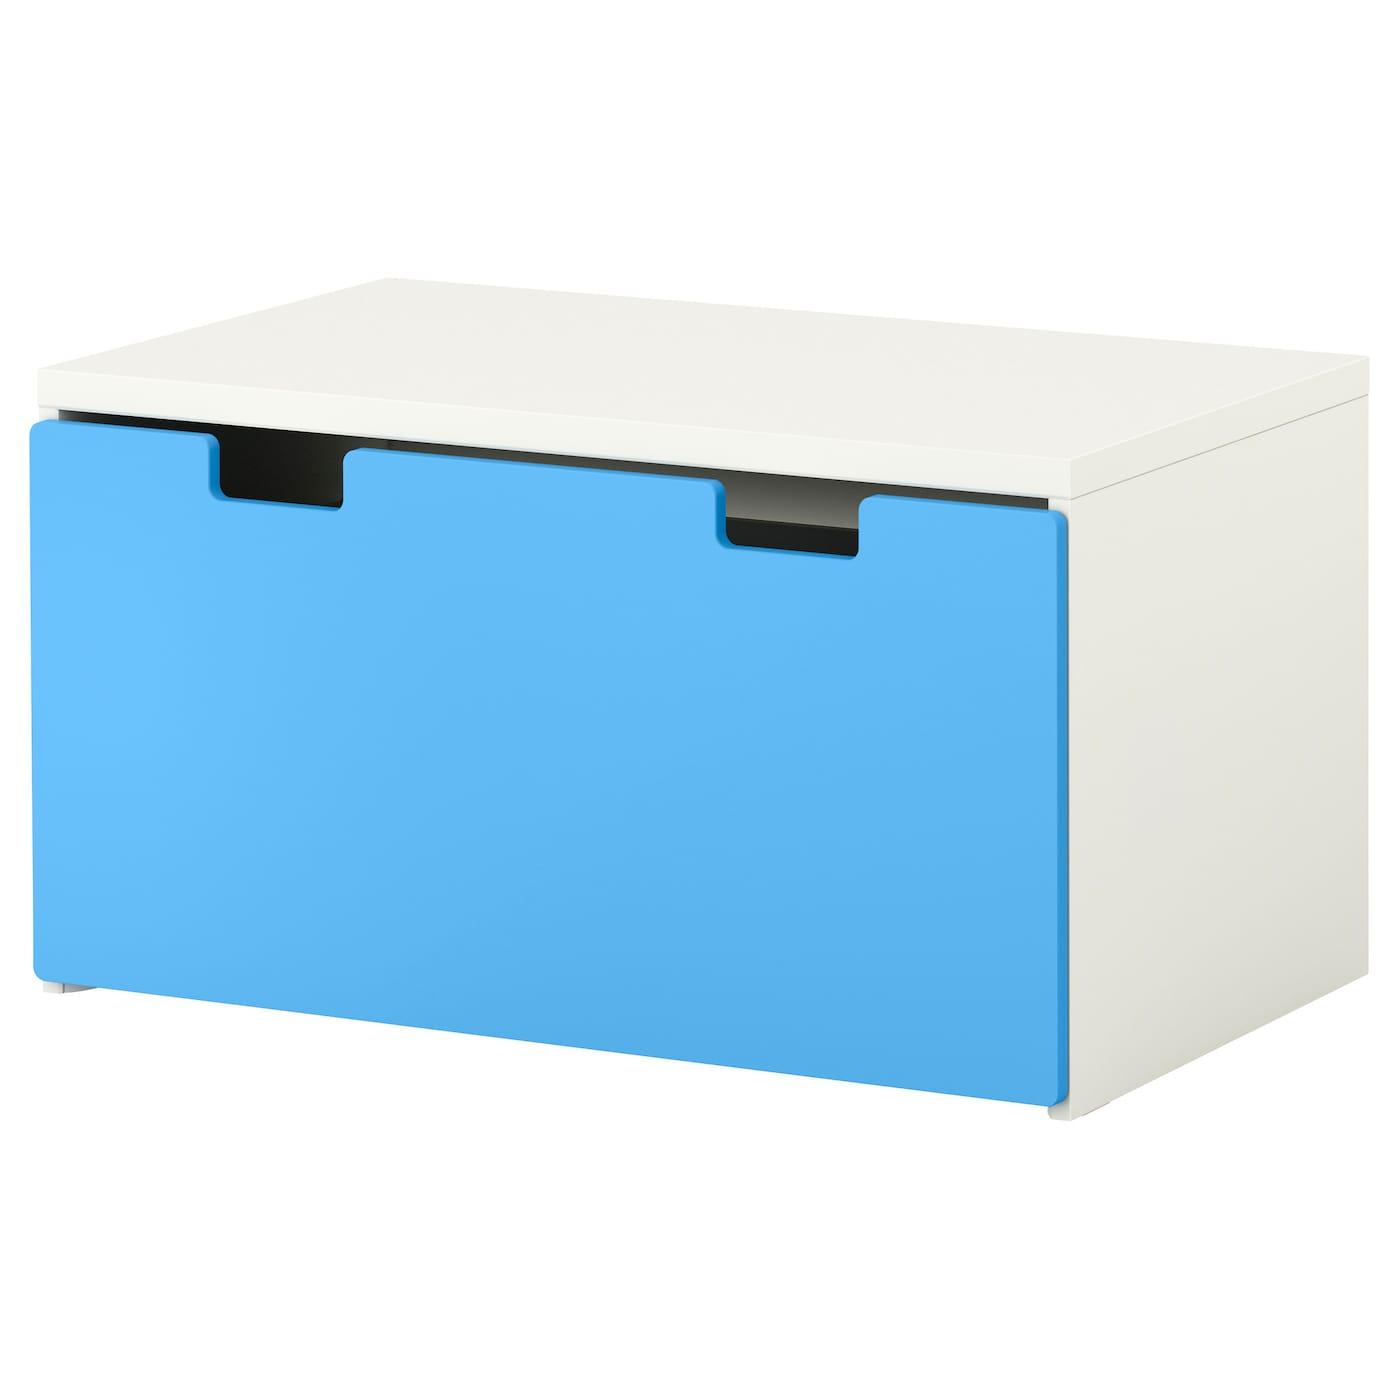 stuva storage bench white blue 90x50x50 cm ikea. Black Bedroom Furniture Sets. Home Design Ideas